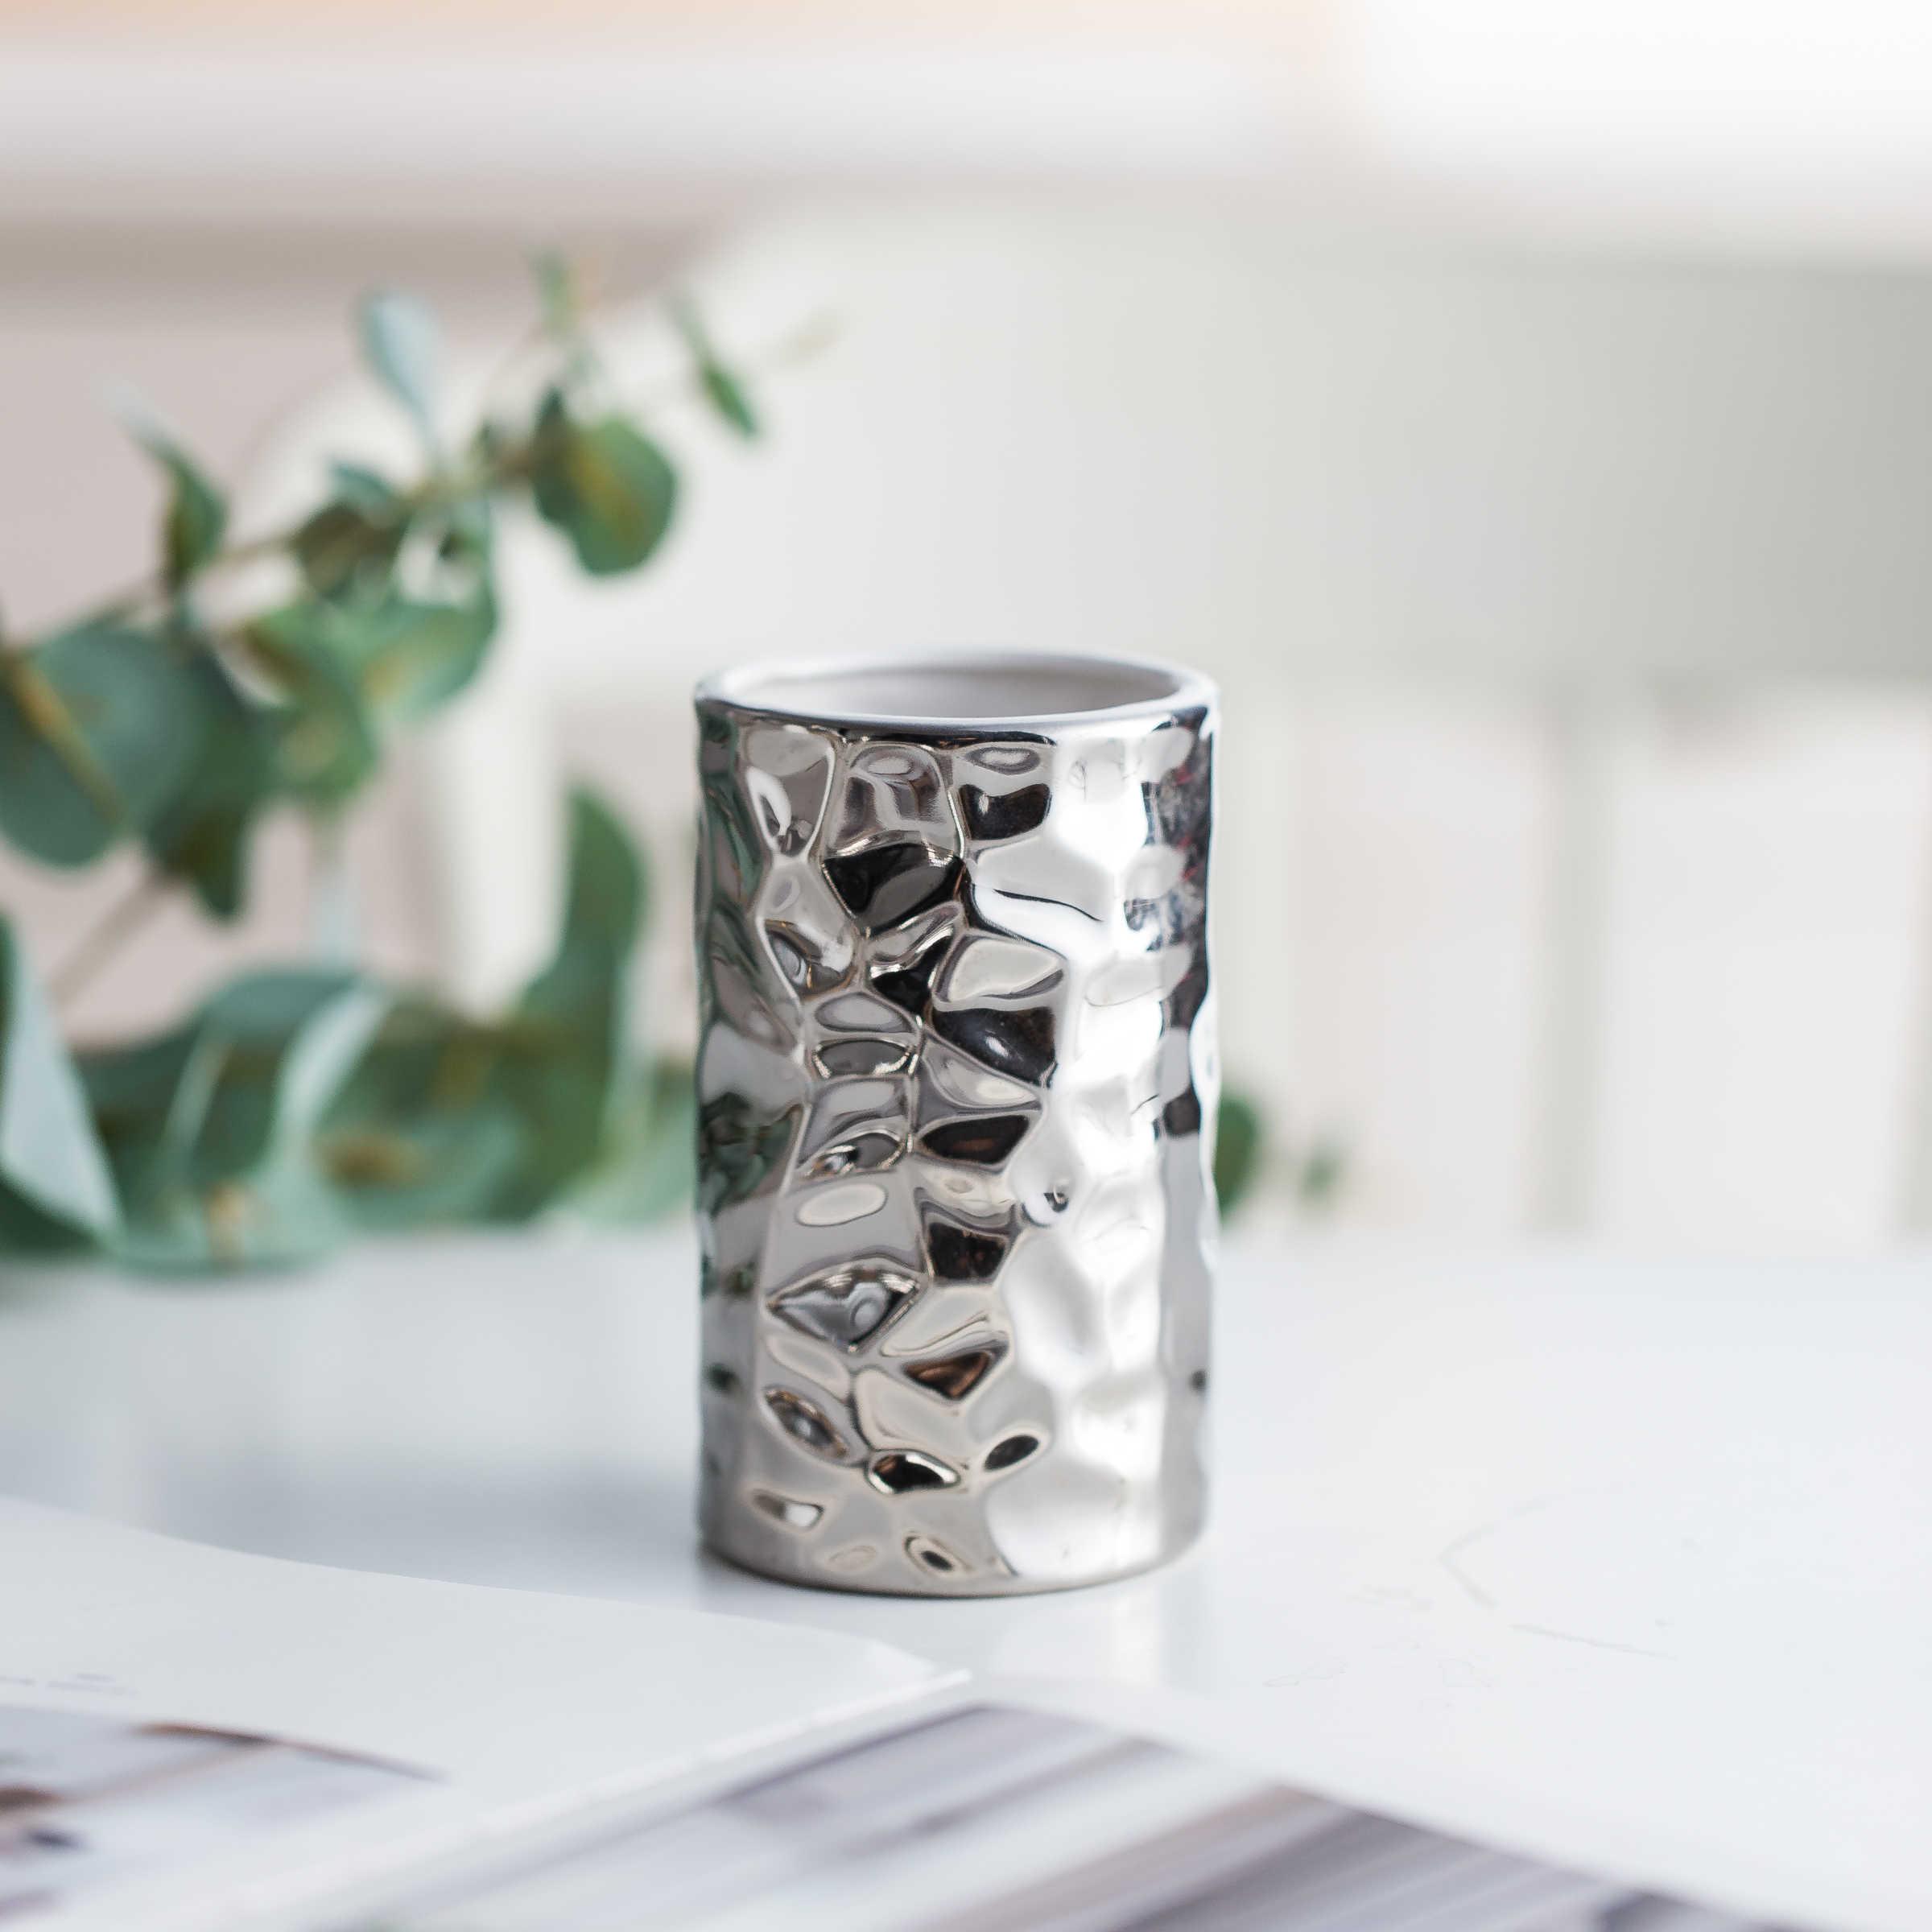 European Style Ceramic Bathroom Set Silver Plated Washroom Bathroom Accessories Wash Cups Toothbrush Holder Soap Dish Dispenser Y19061804